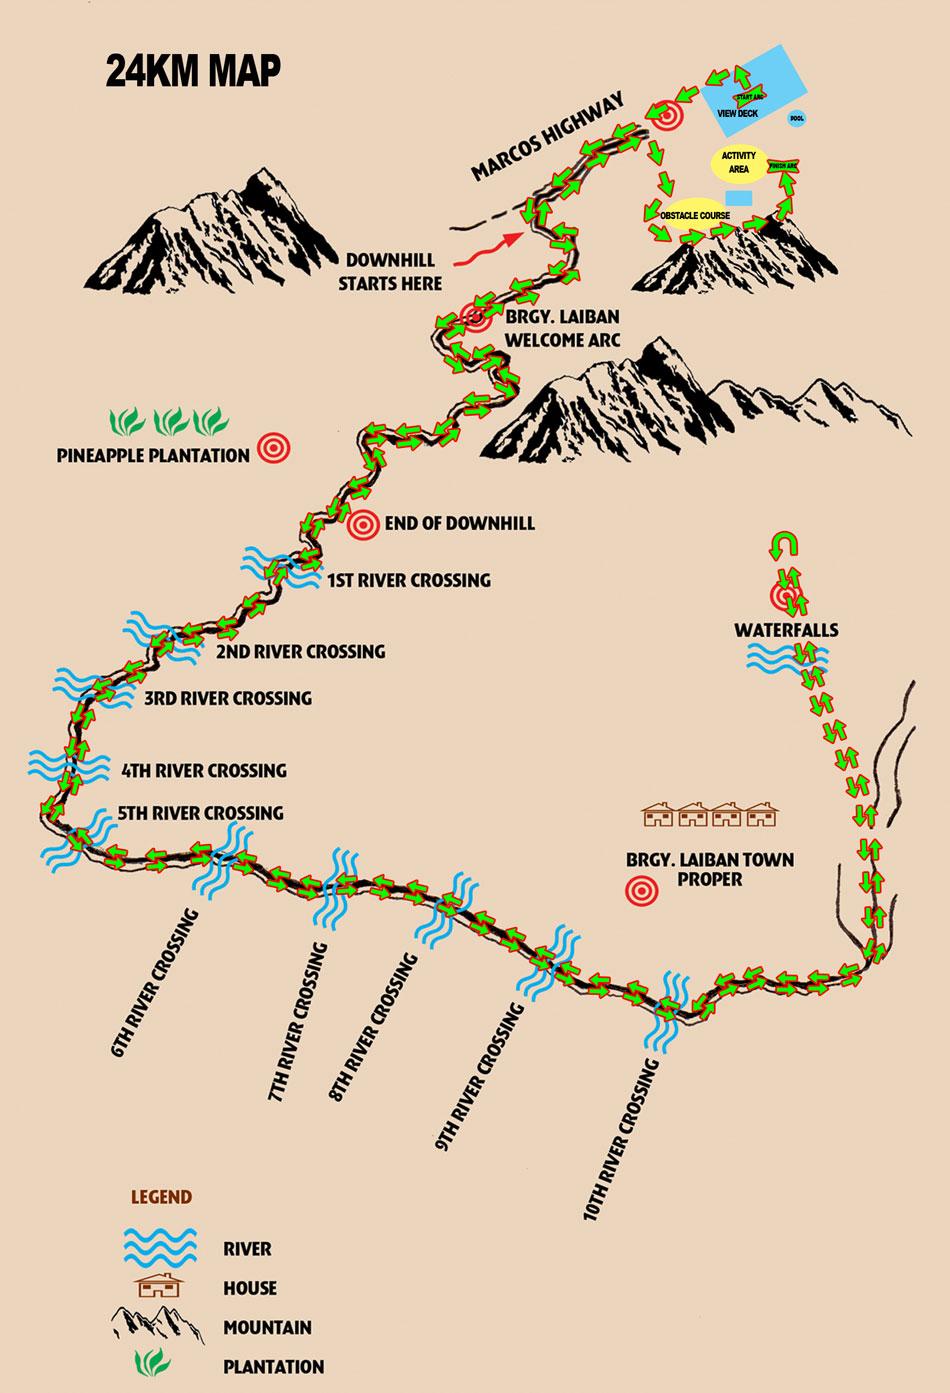 Brooks-Run-Happy-2014-24K-Map